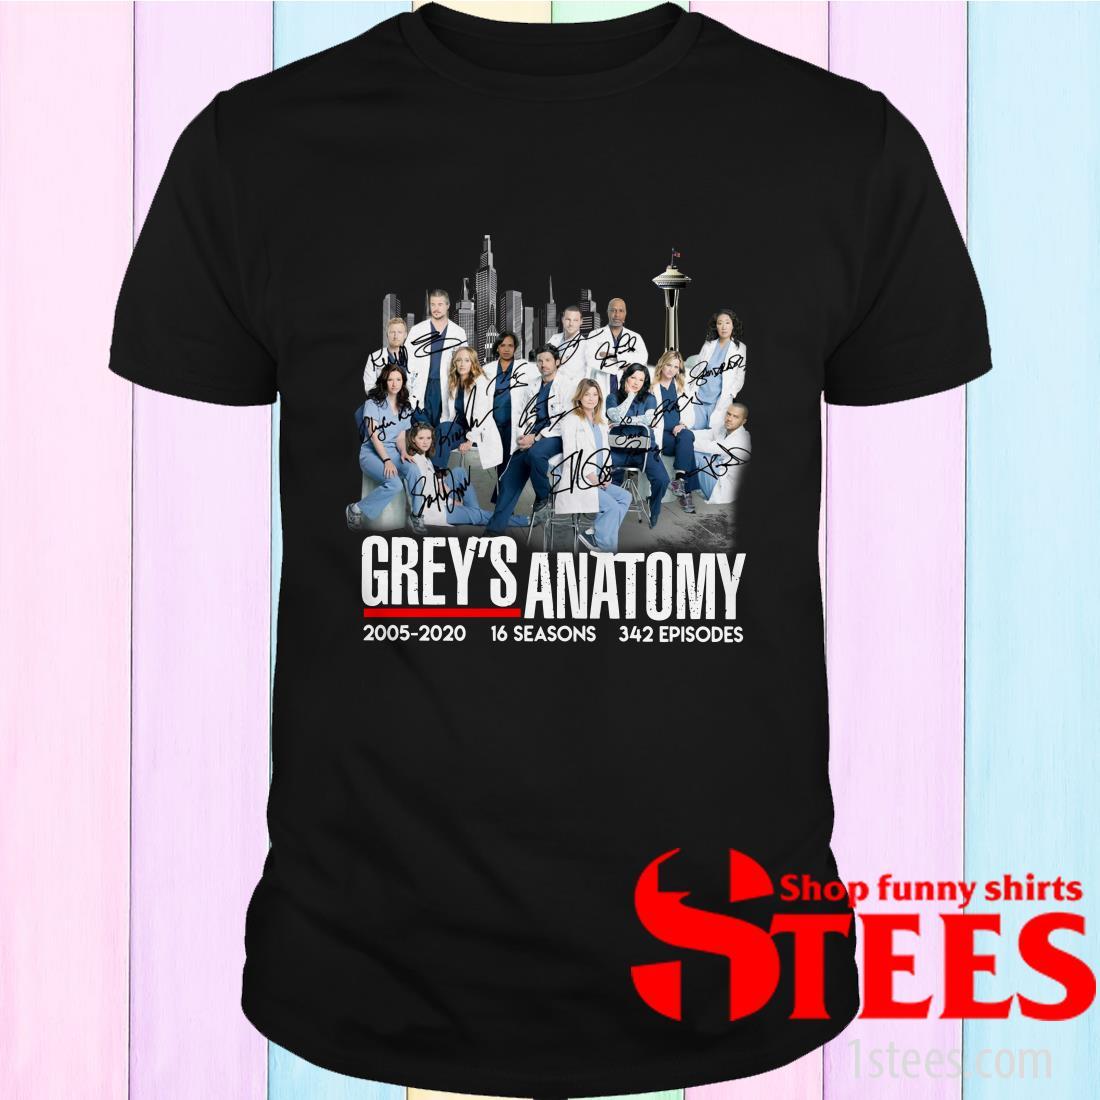 Grey's Anatomy 2005-2020 16 Seasons 342 Episodes Signature Shirt